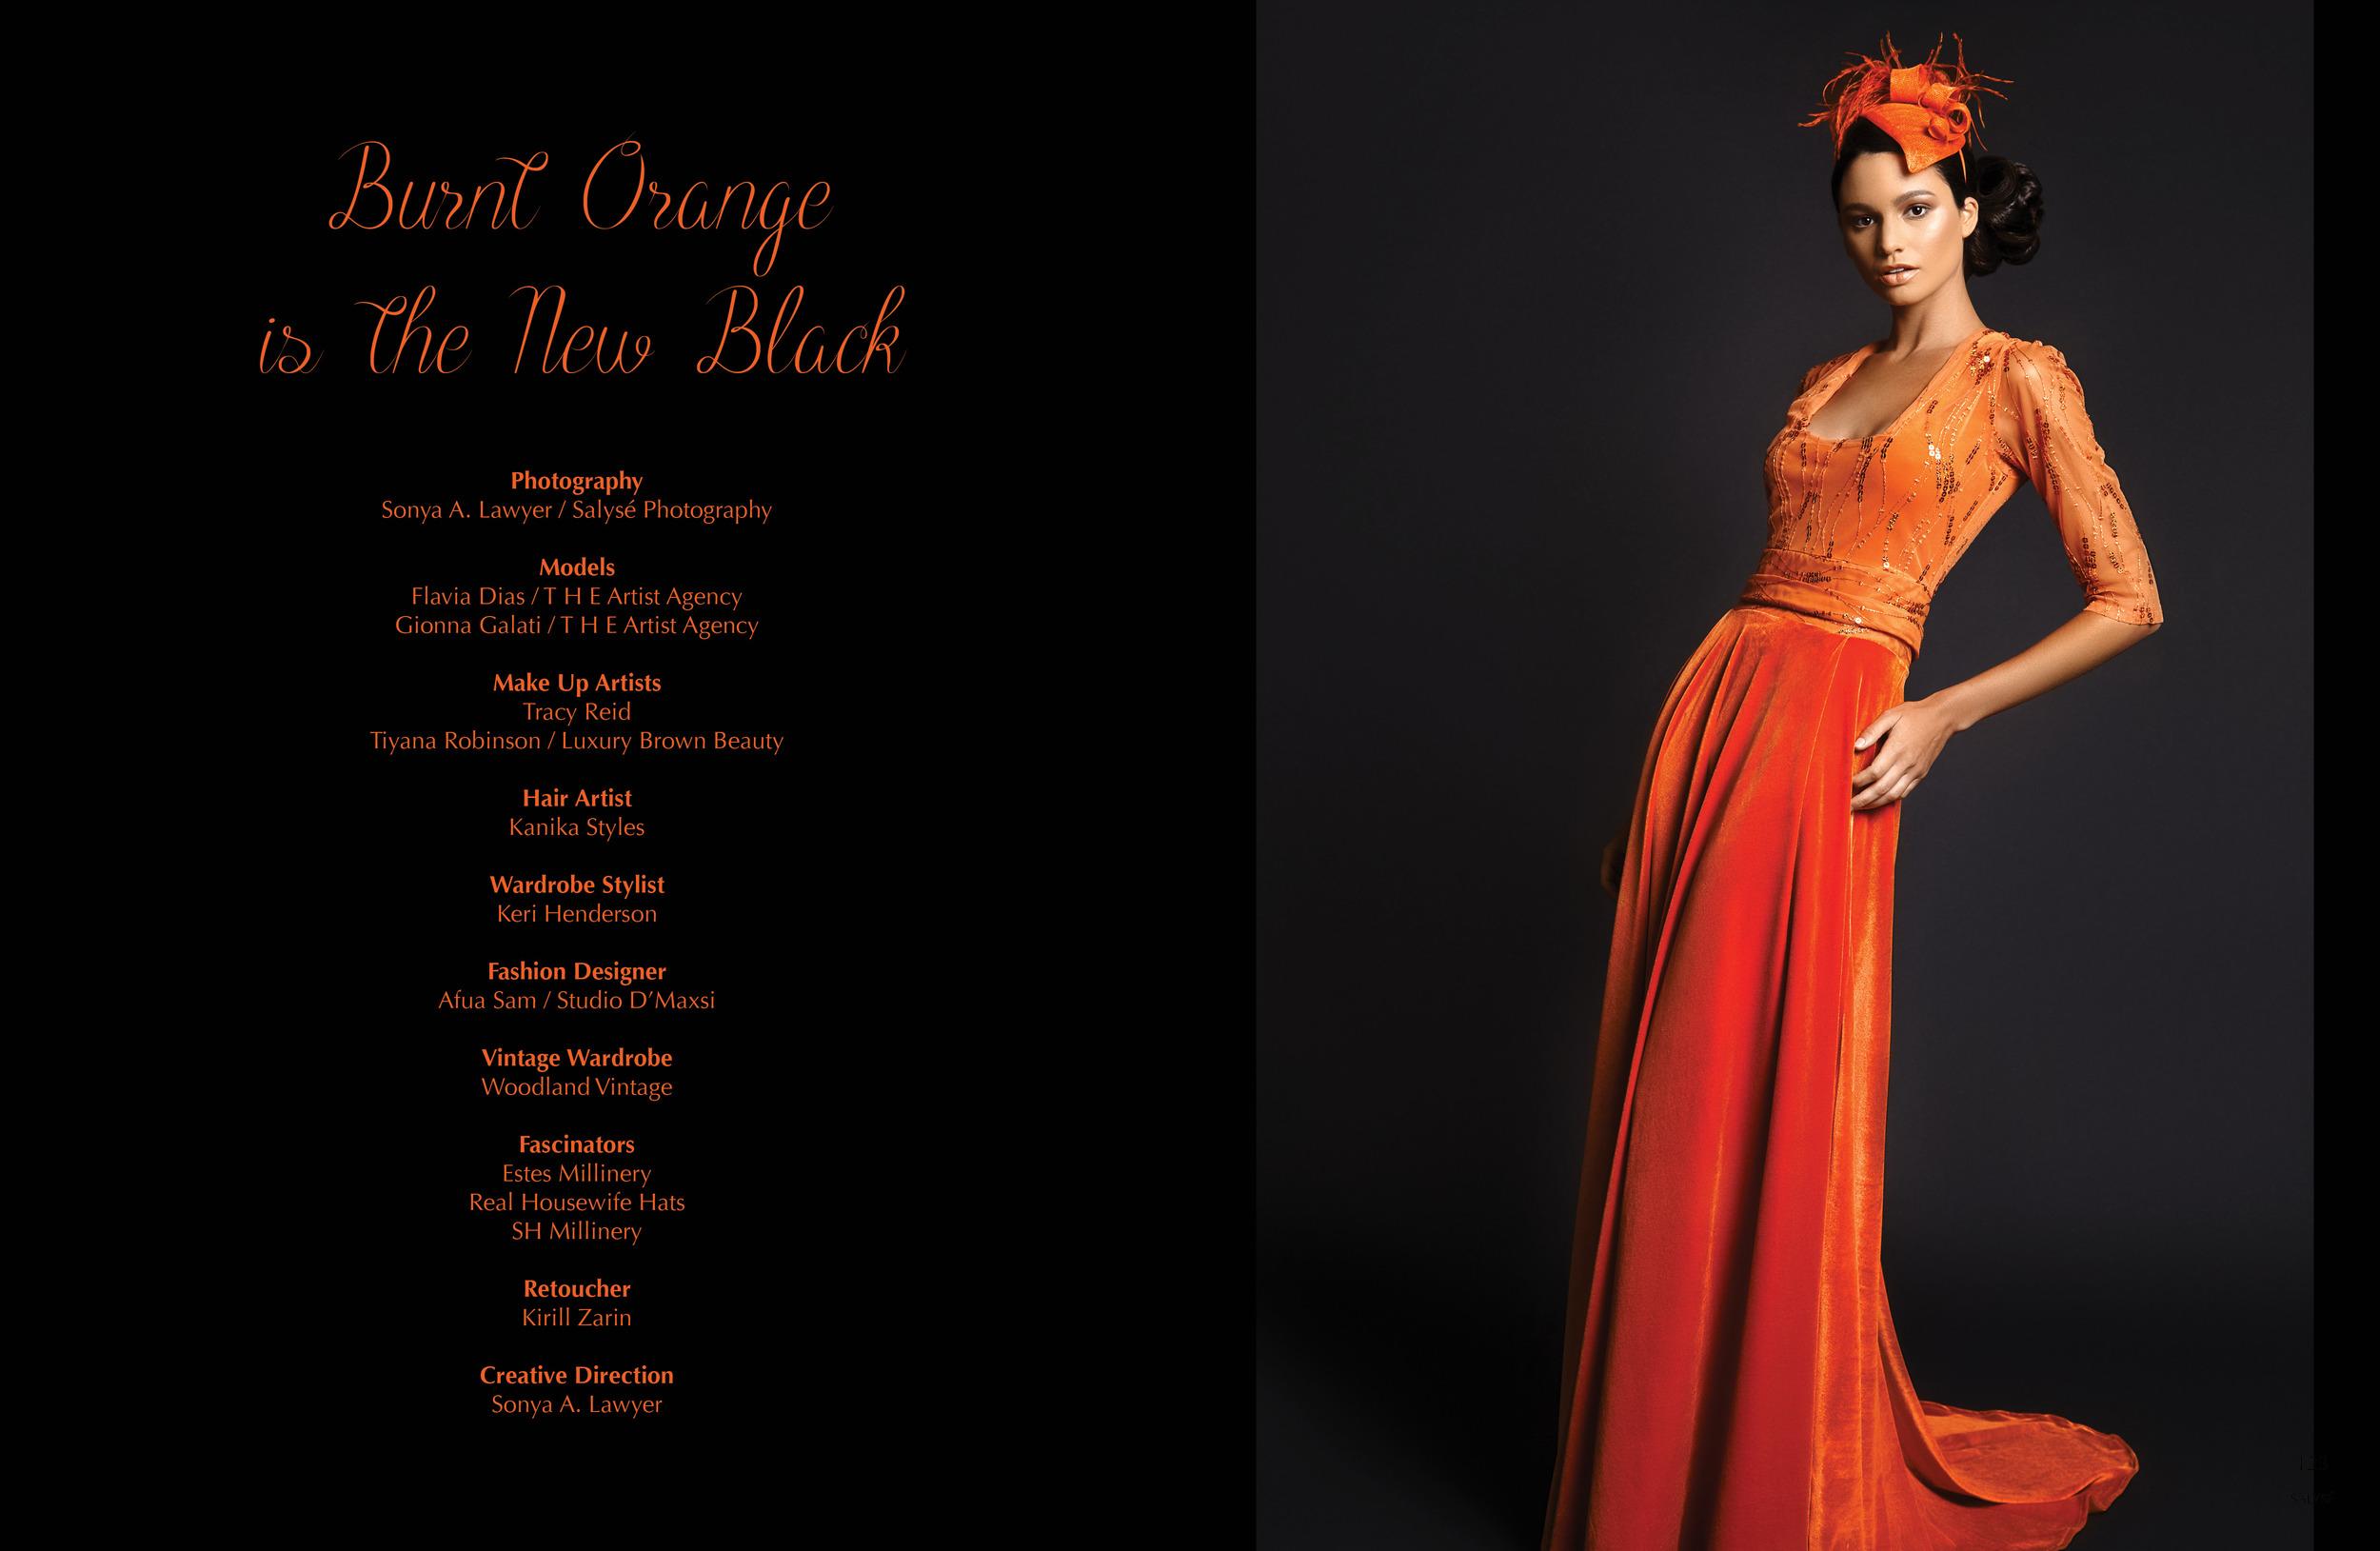 Vol1_No9-10_SepOct15_Sapphire_Orange_MagCloud63.jpg